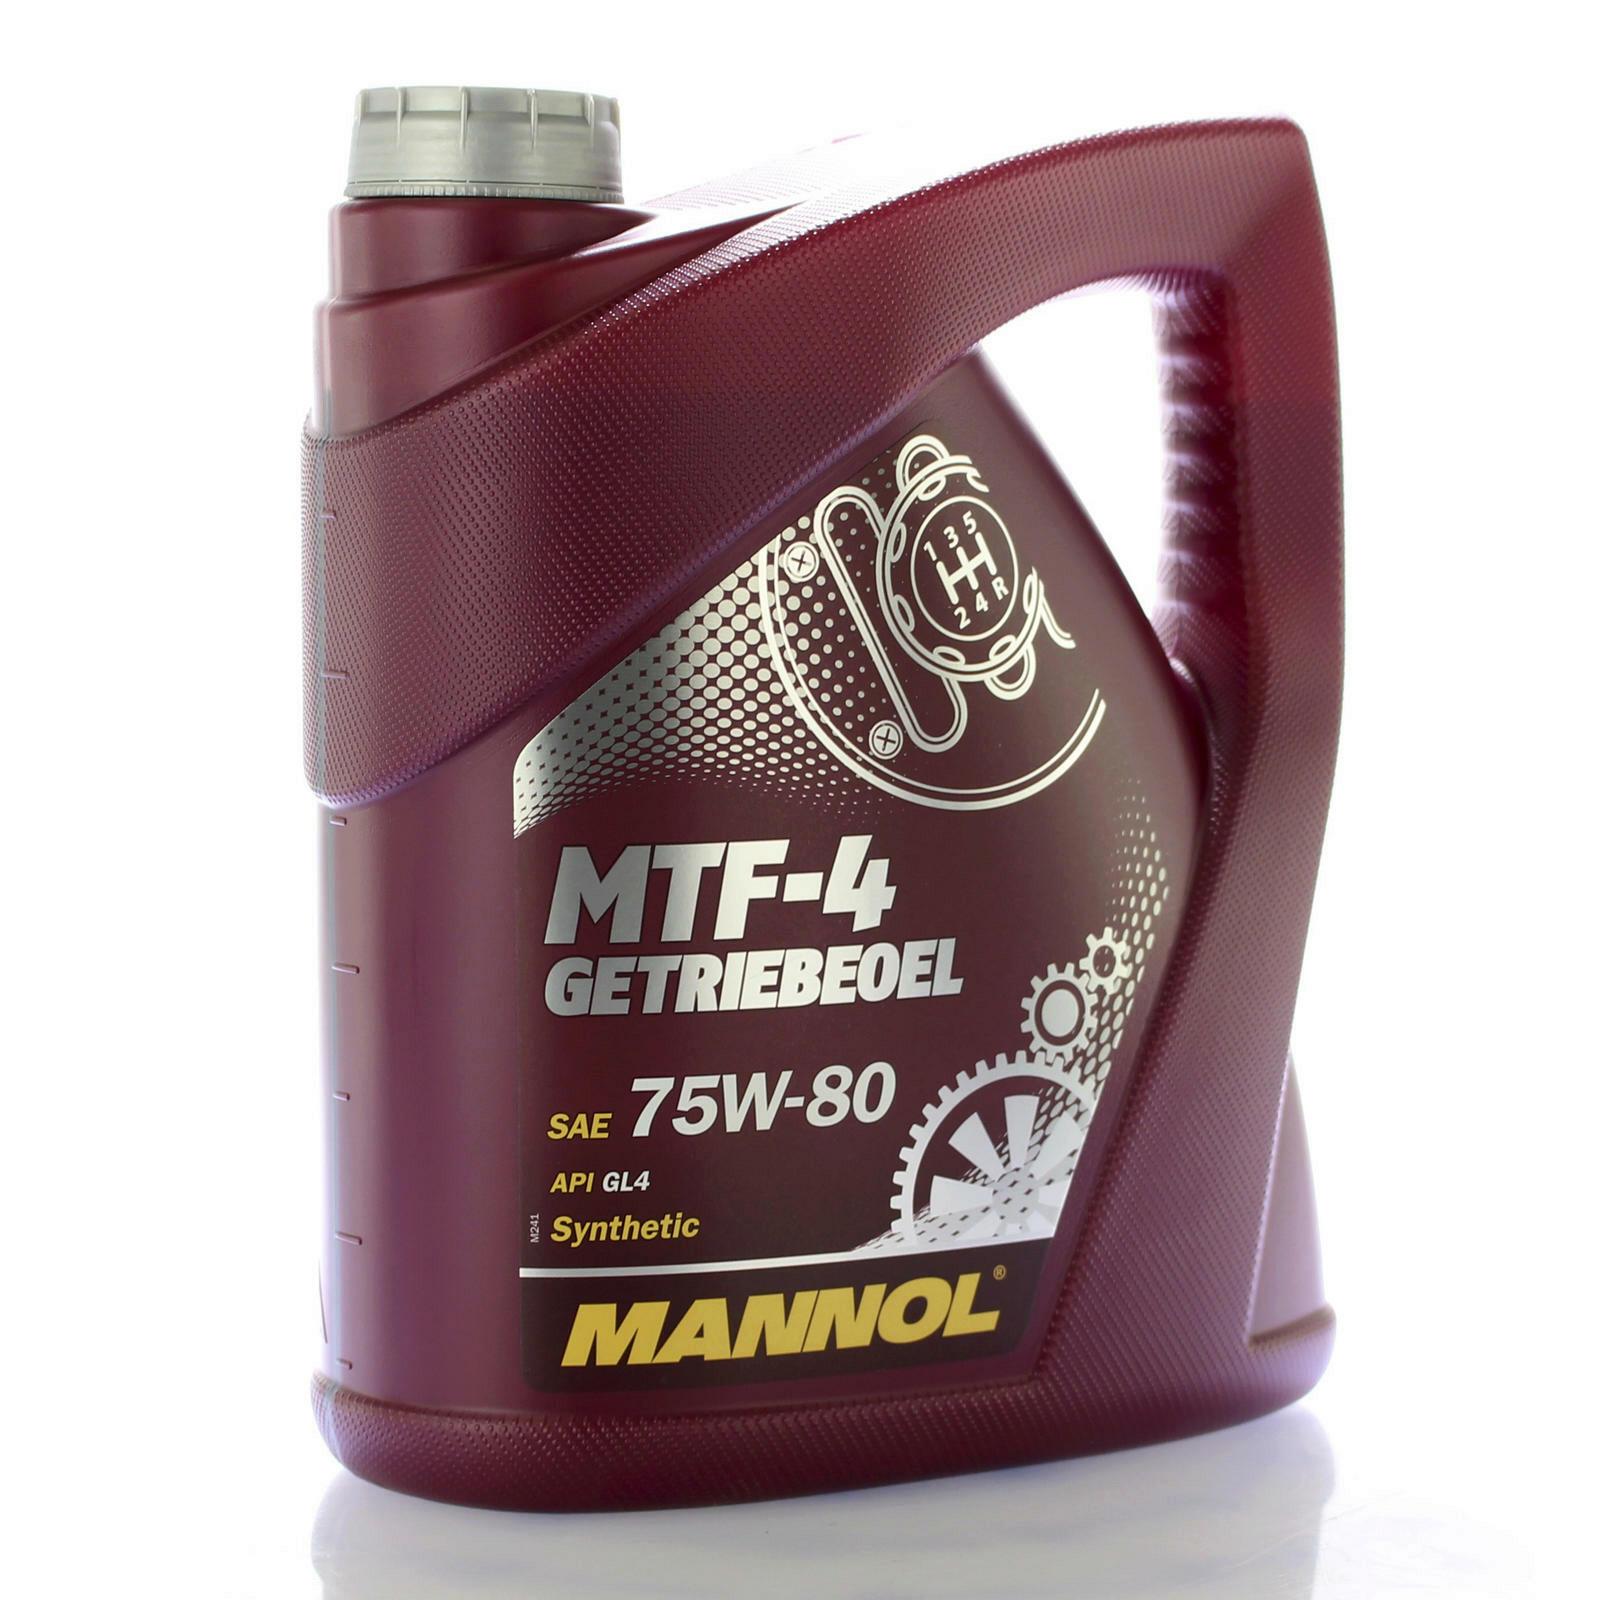 Mannol MTF-4 Getriebeöl 4L